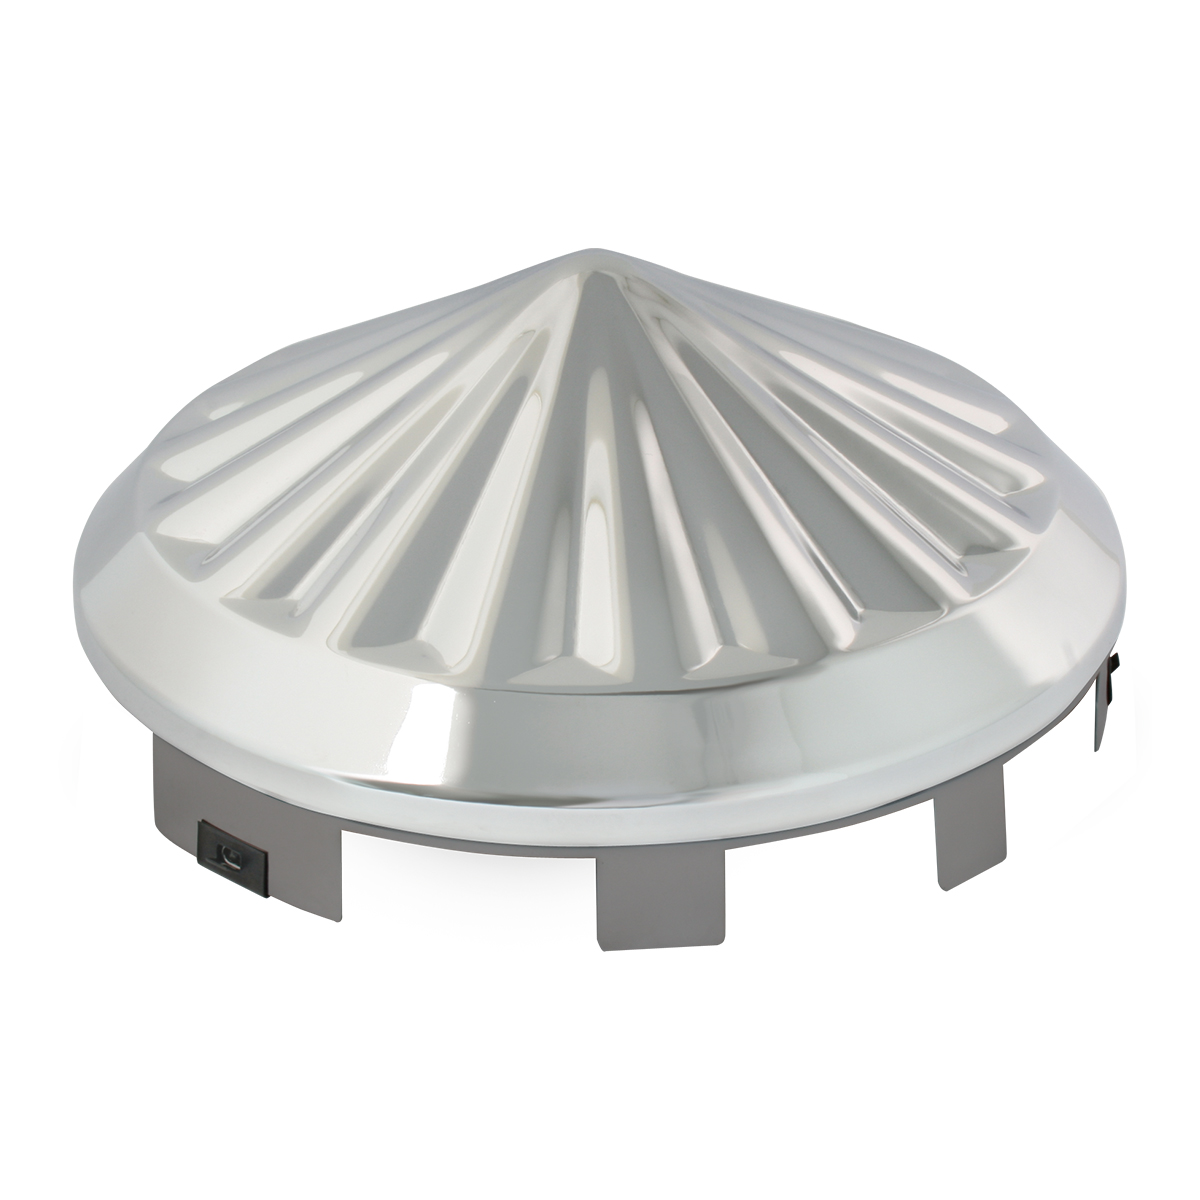 10753/10754 Universal Front Hub Cap in Pin Wheel Shape